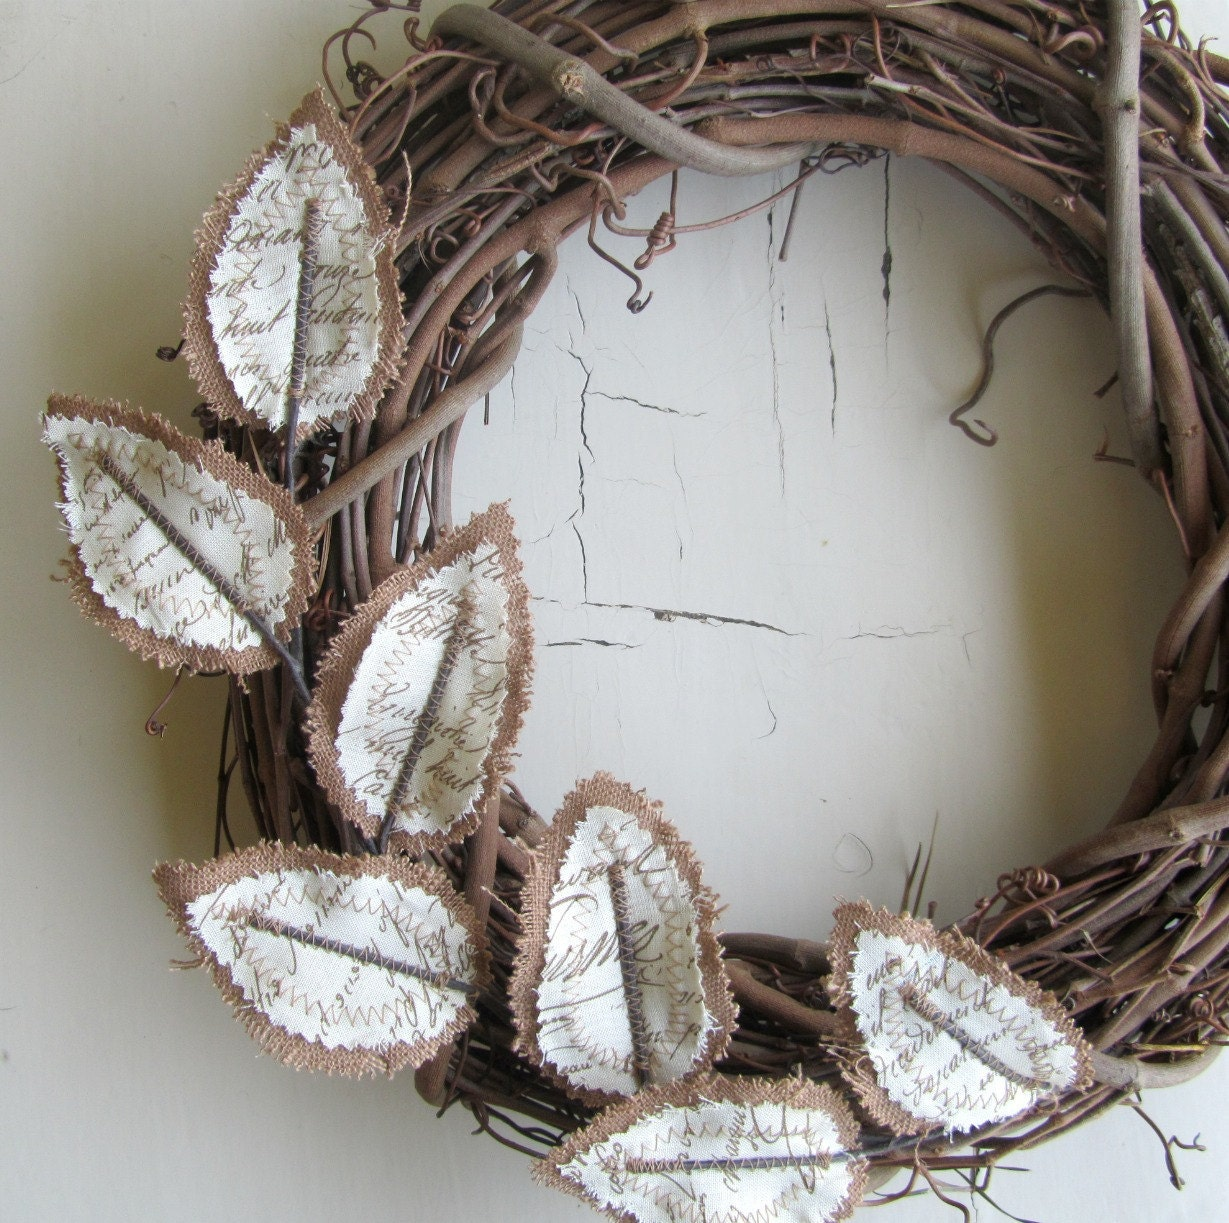 Fabric Leaf Wreath - Burlap Brown Linen Antique Handwriting Script Christmas Gift Idea - janejoss